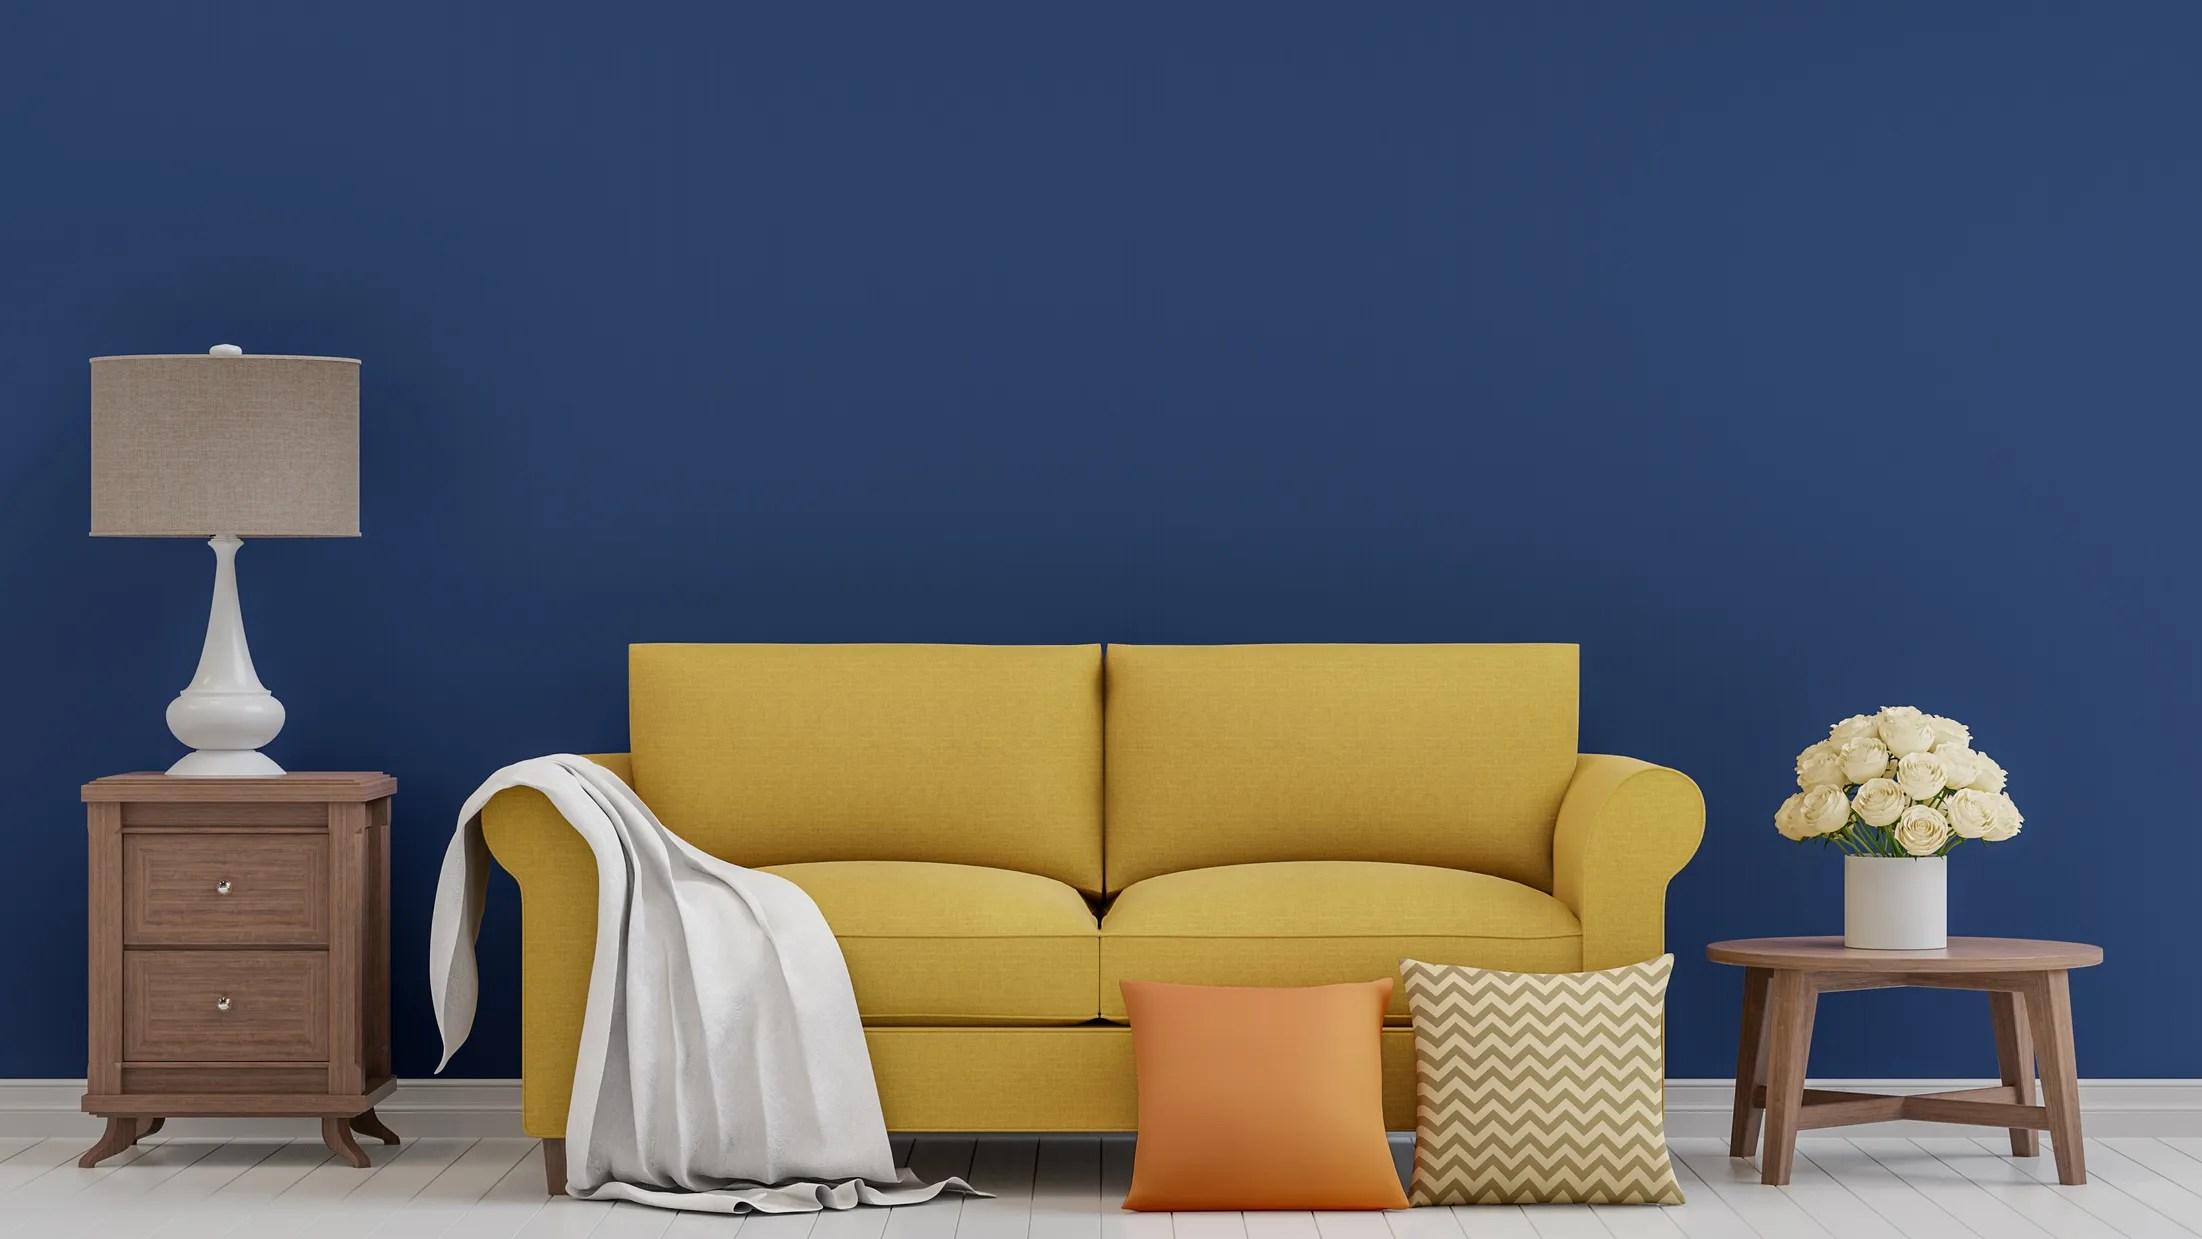 best deals on living room furniture bench seats for cyber monday 2018 the target wayfair casper sales